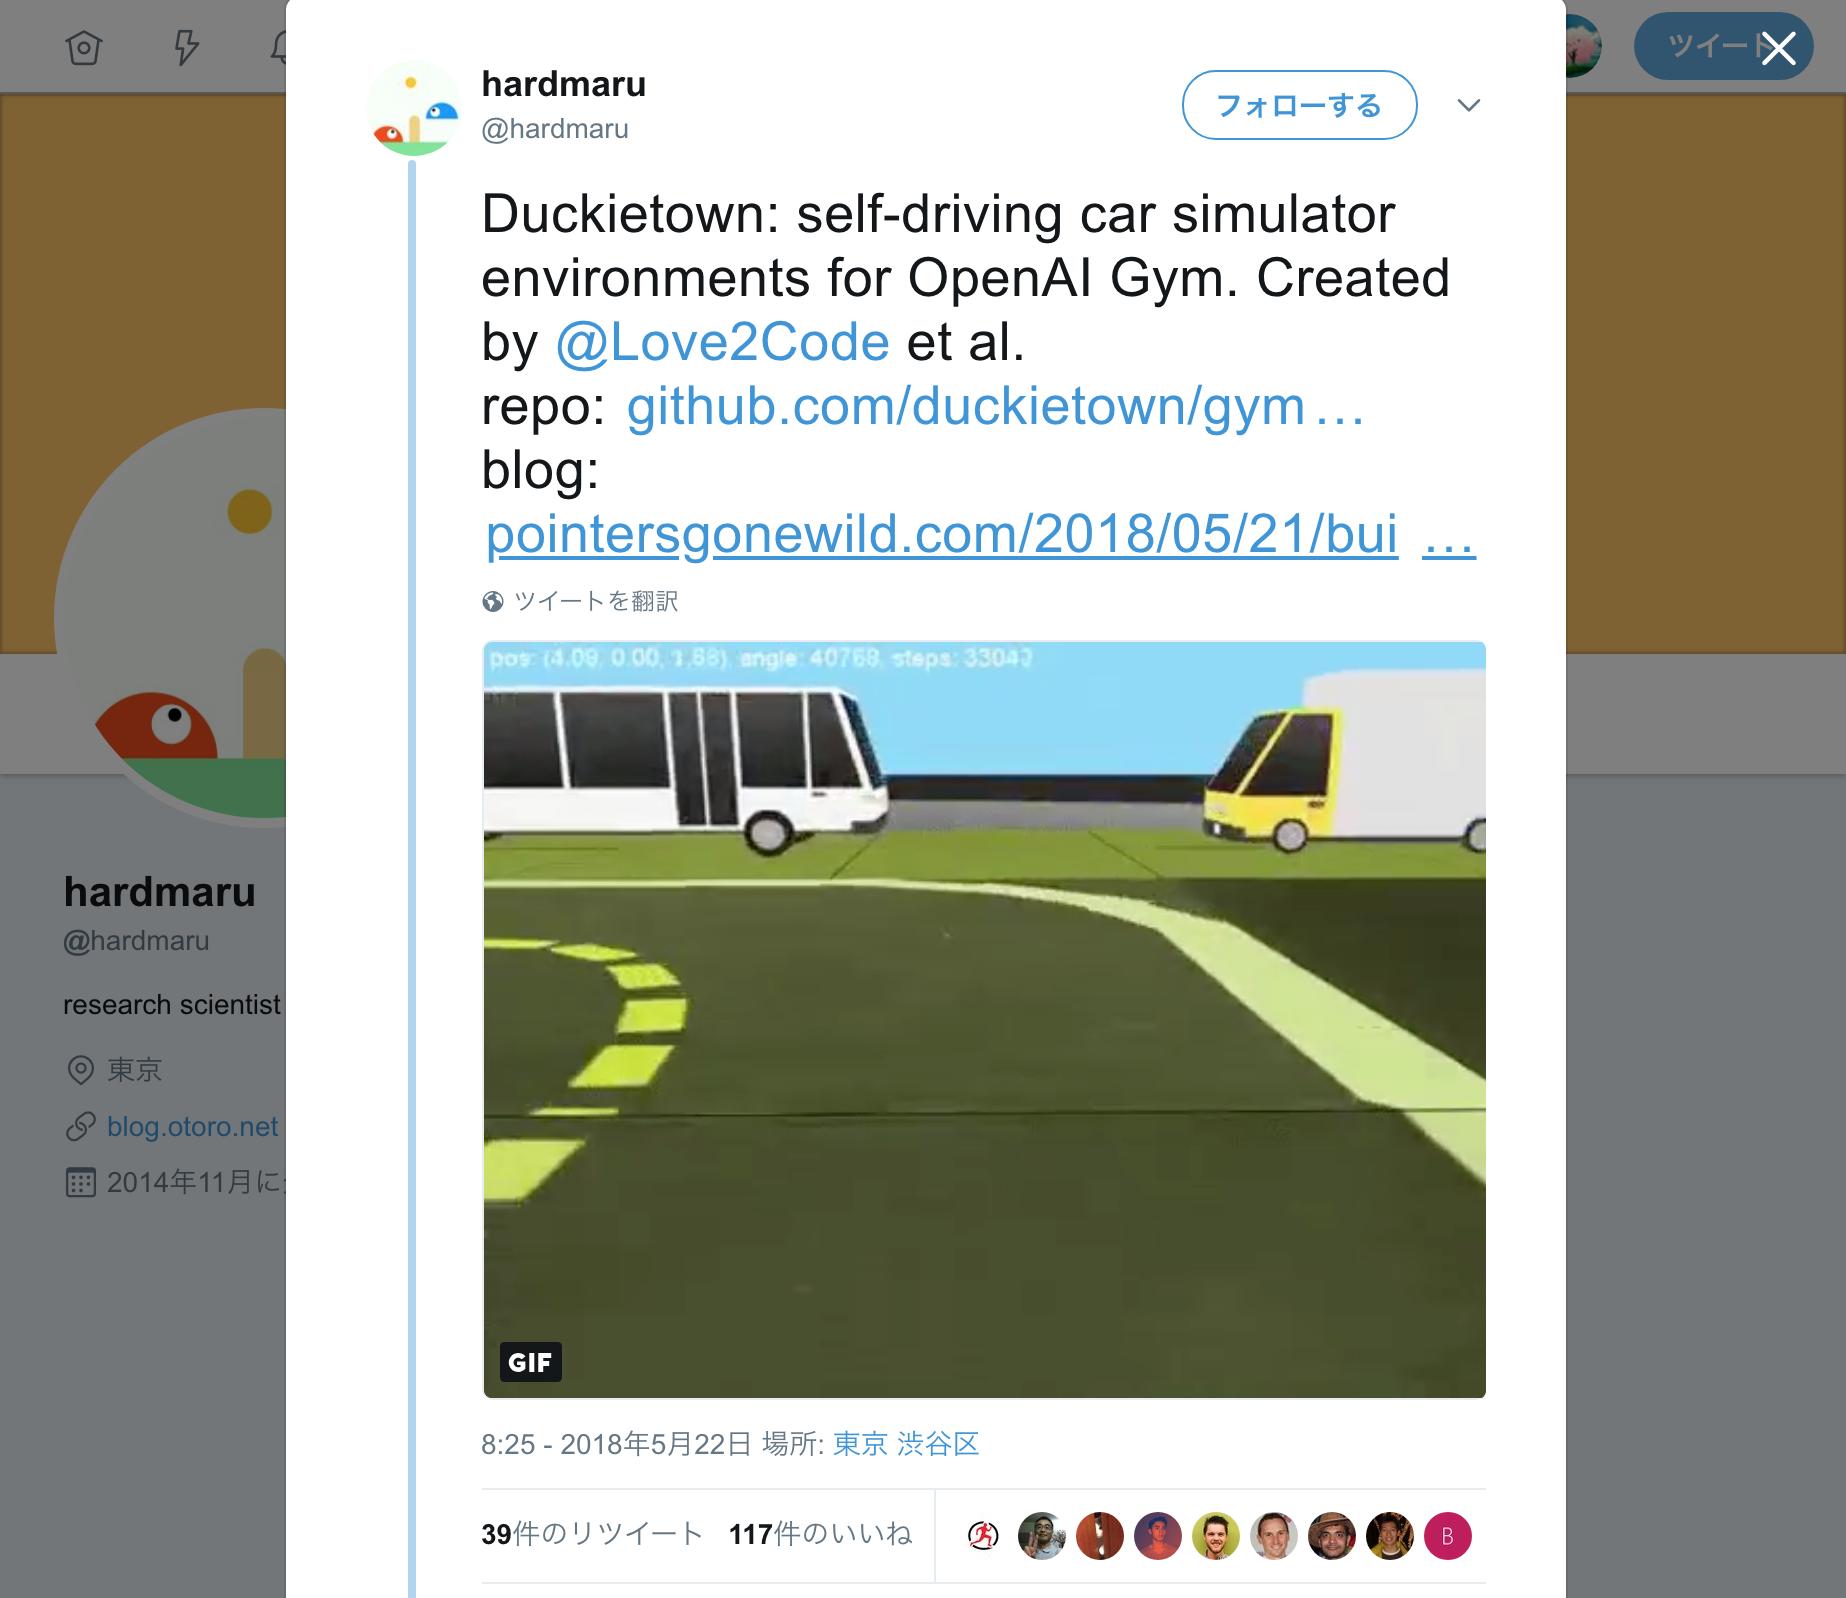 Duckietown_self_driving_car_simulator_environments_for_OpenAI_Gym_by_hardmaru.png